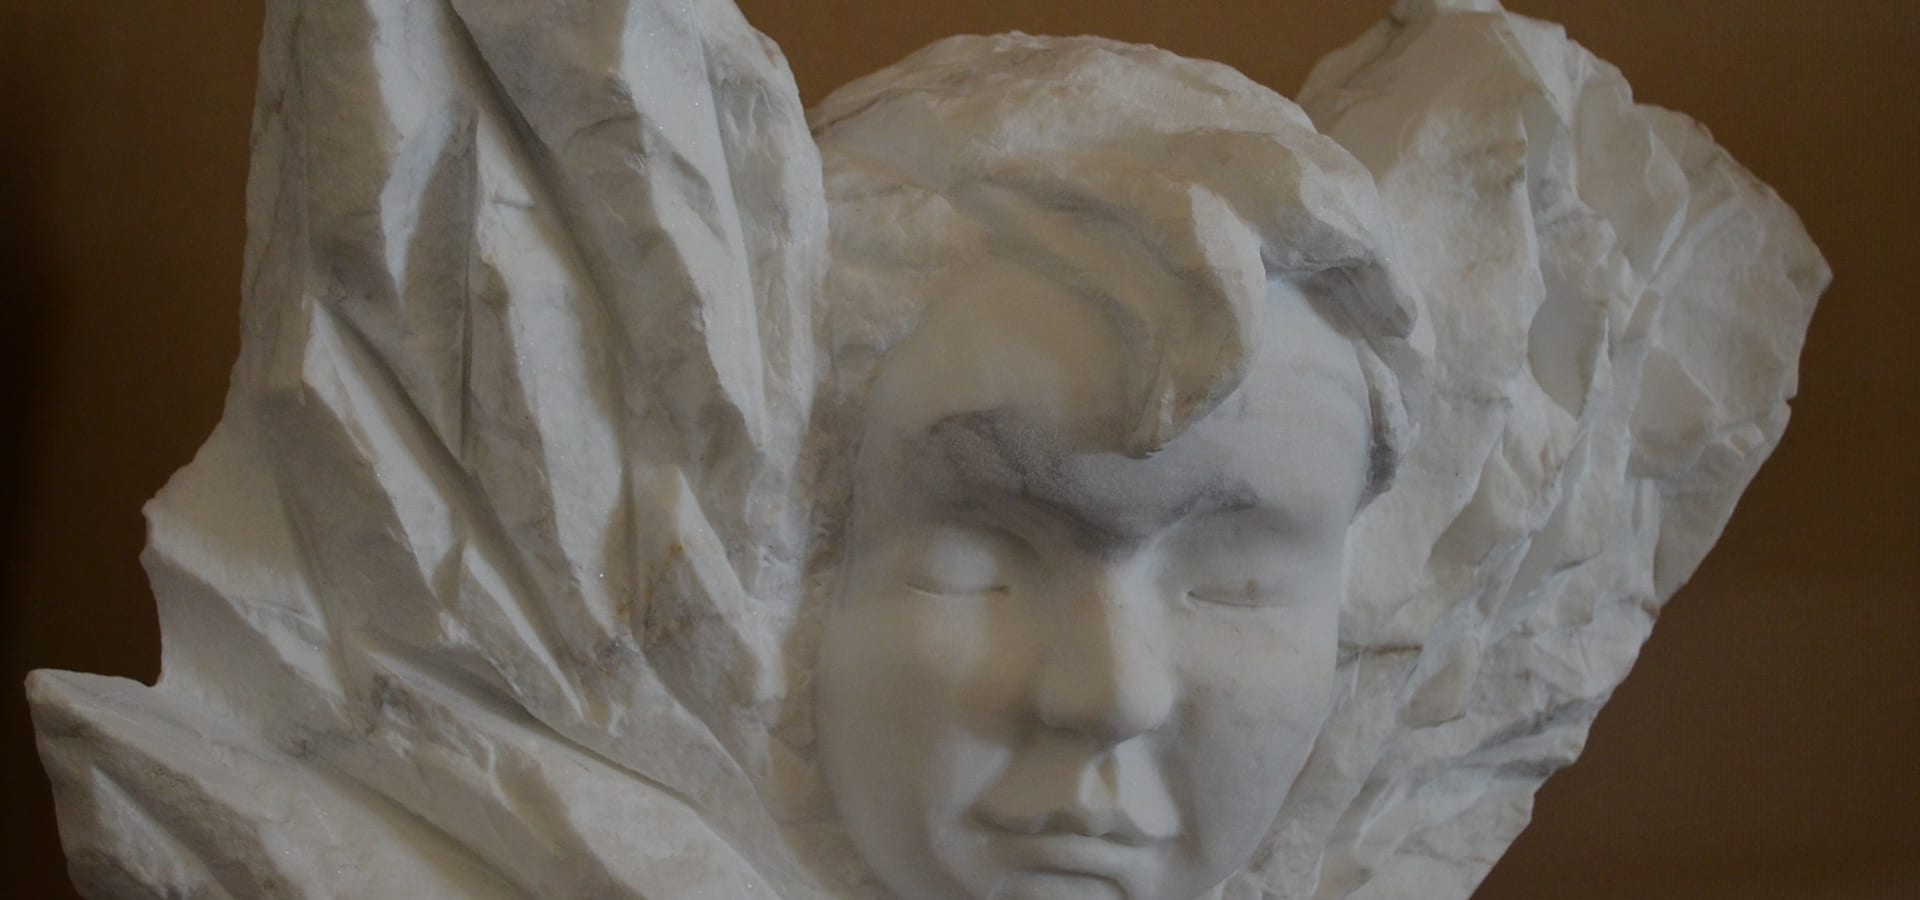 Mancardi Sculpture